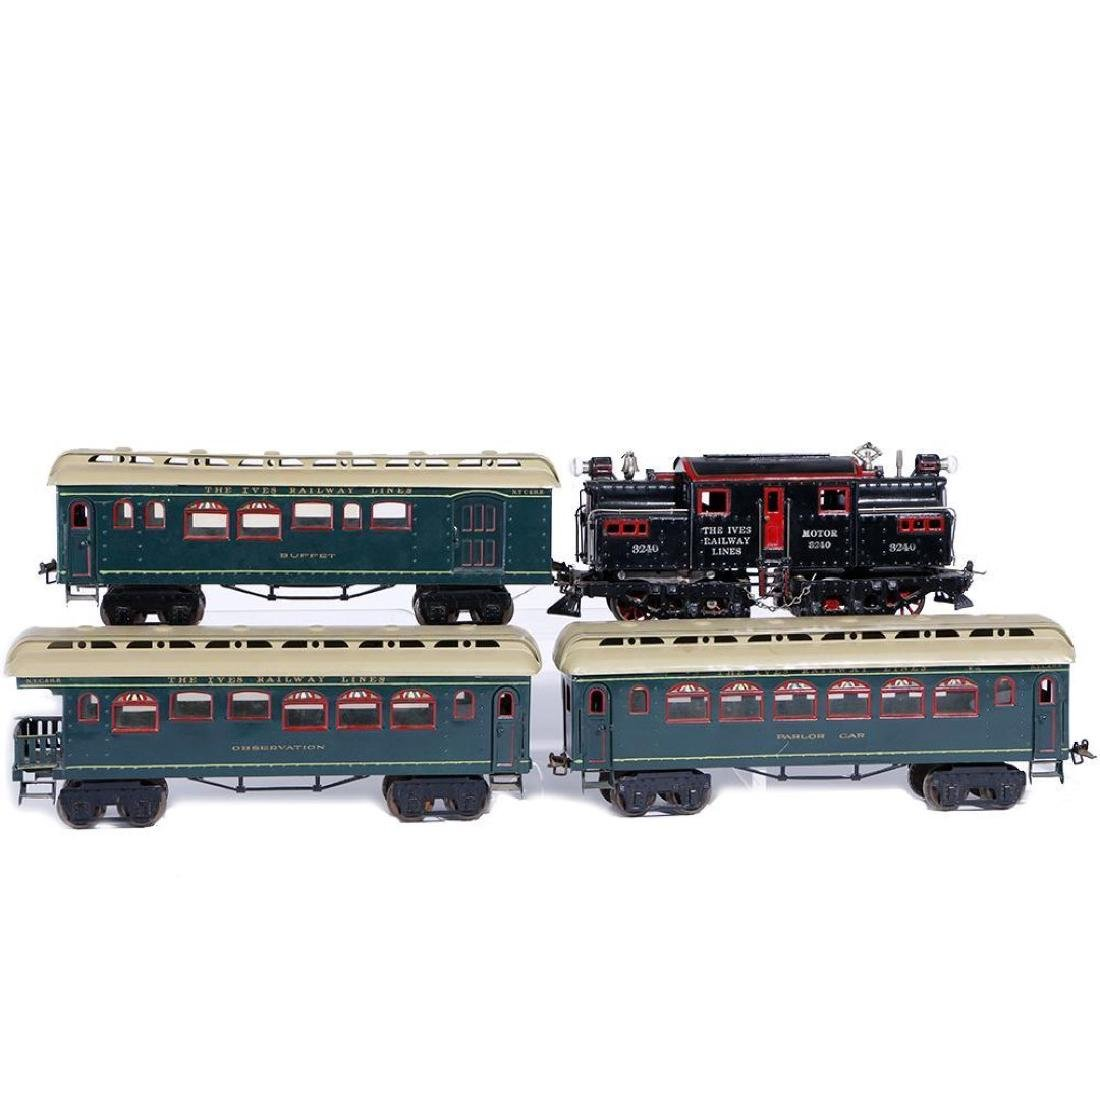 Ives #1 Gauge 3240 Locomotive with 3 Passenger Cars